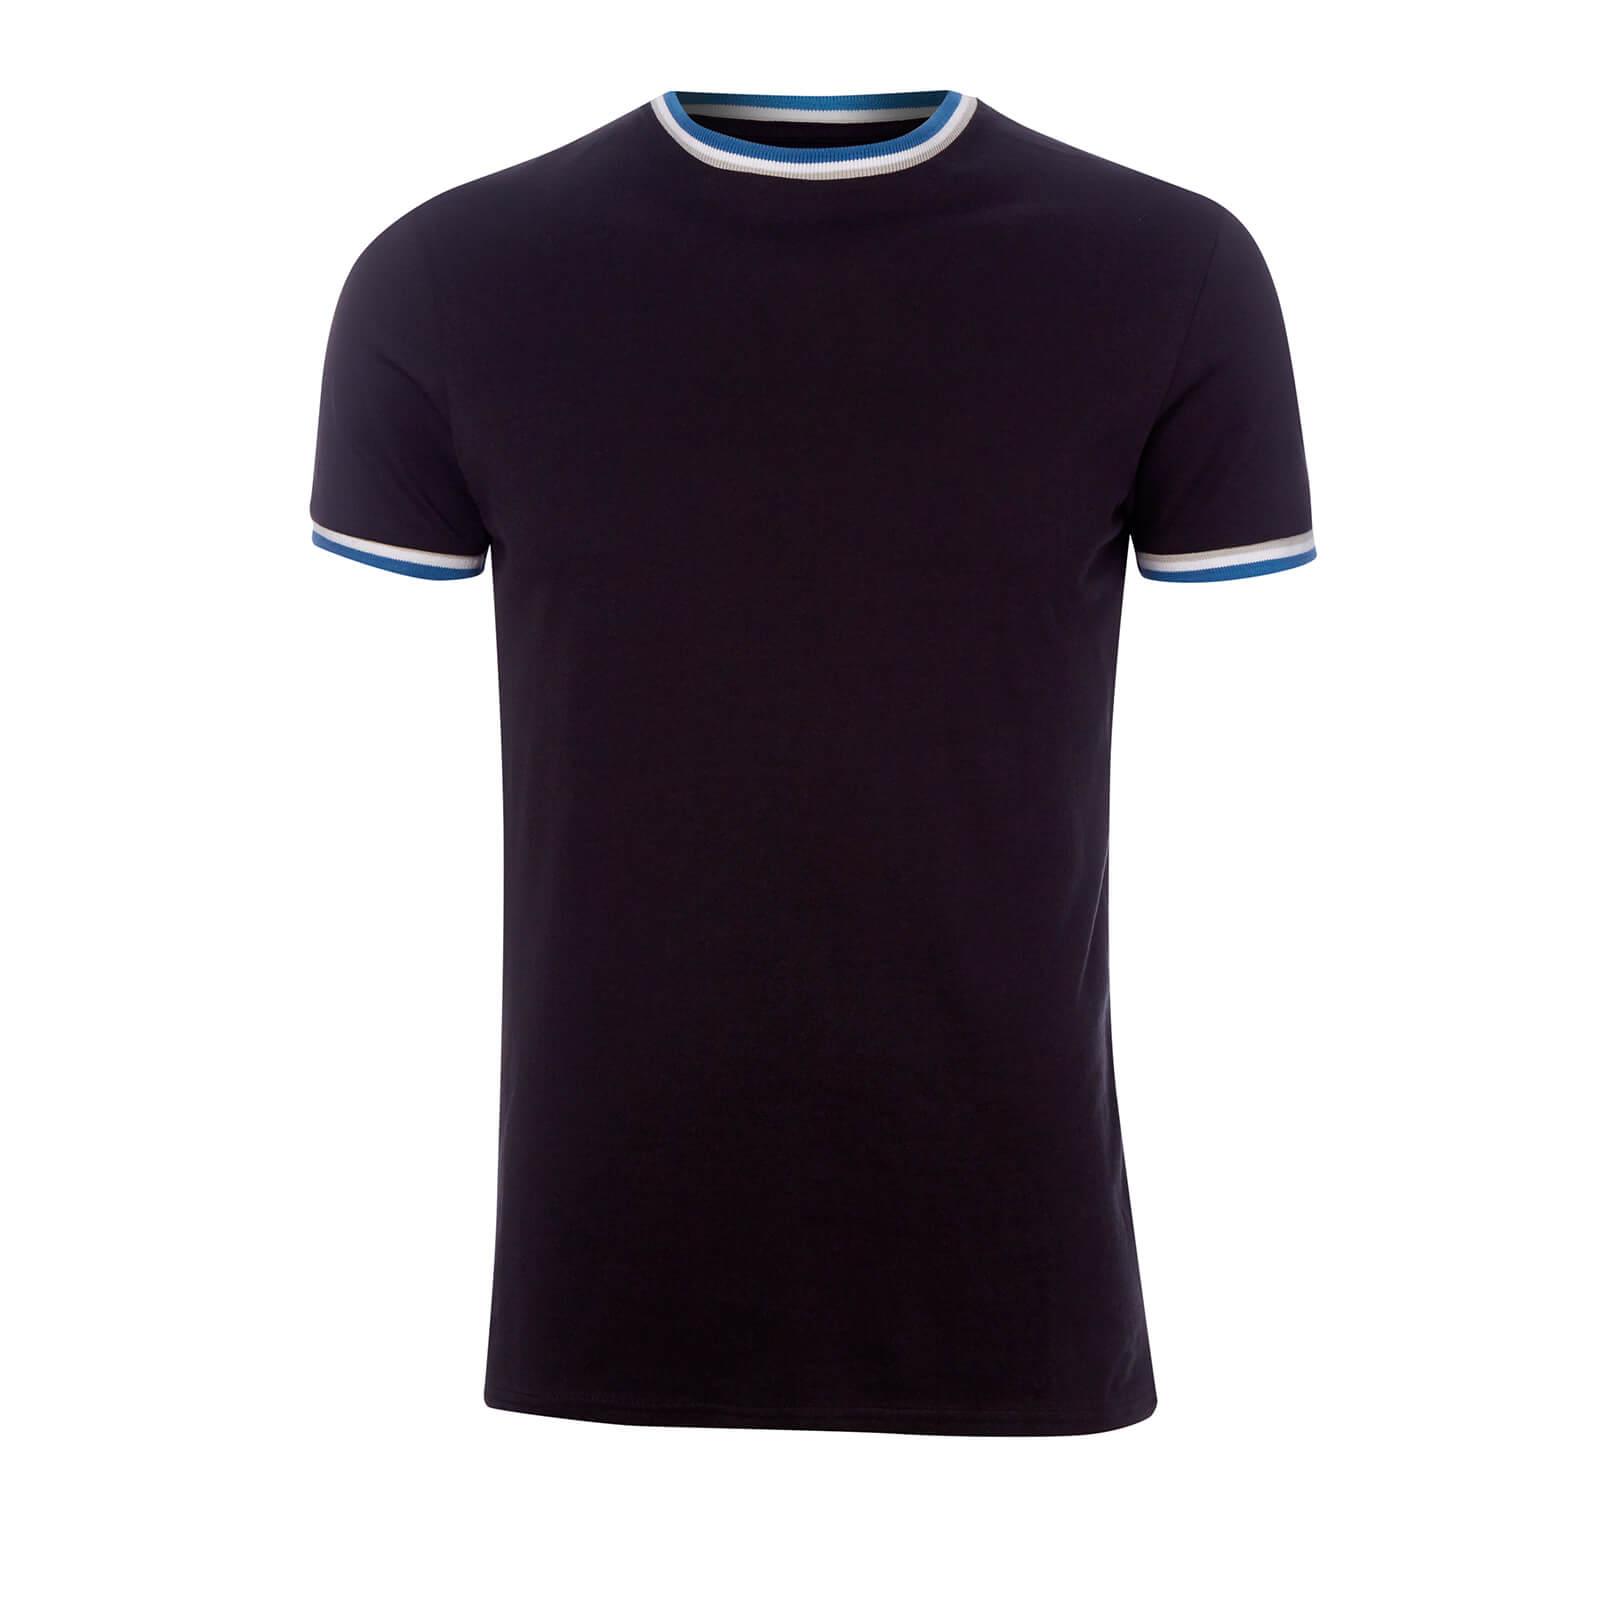 Broken Standard Men's Sacombe Tipped T-Shirt - Black - XL - Black